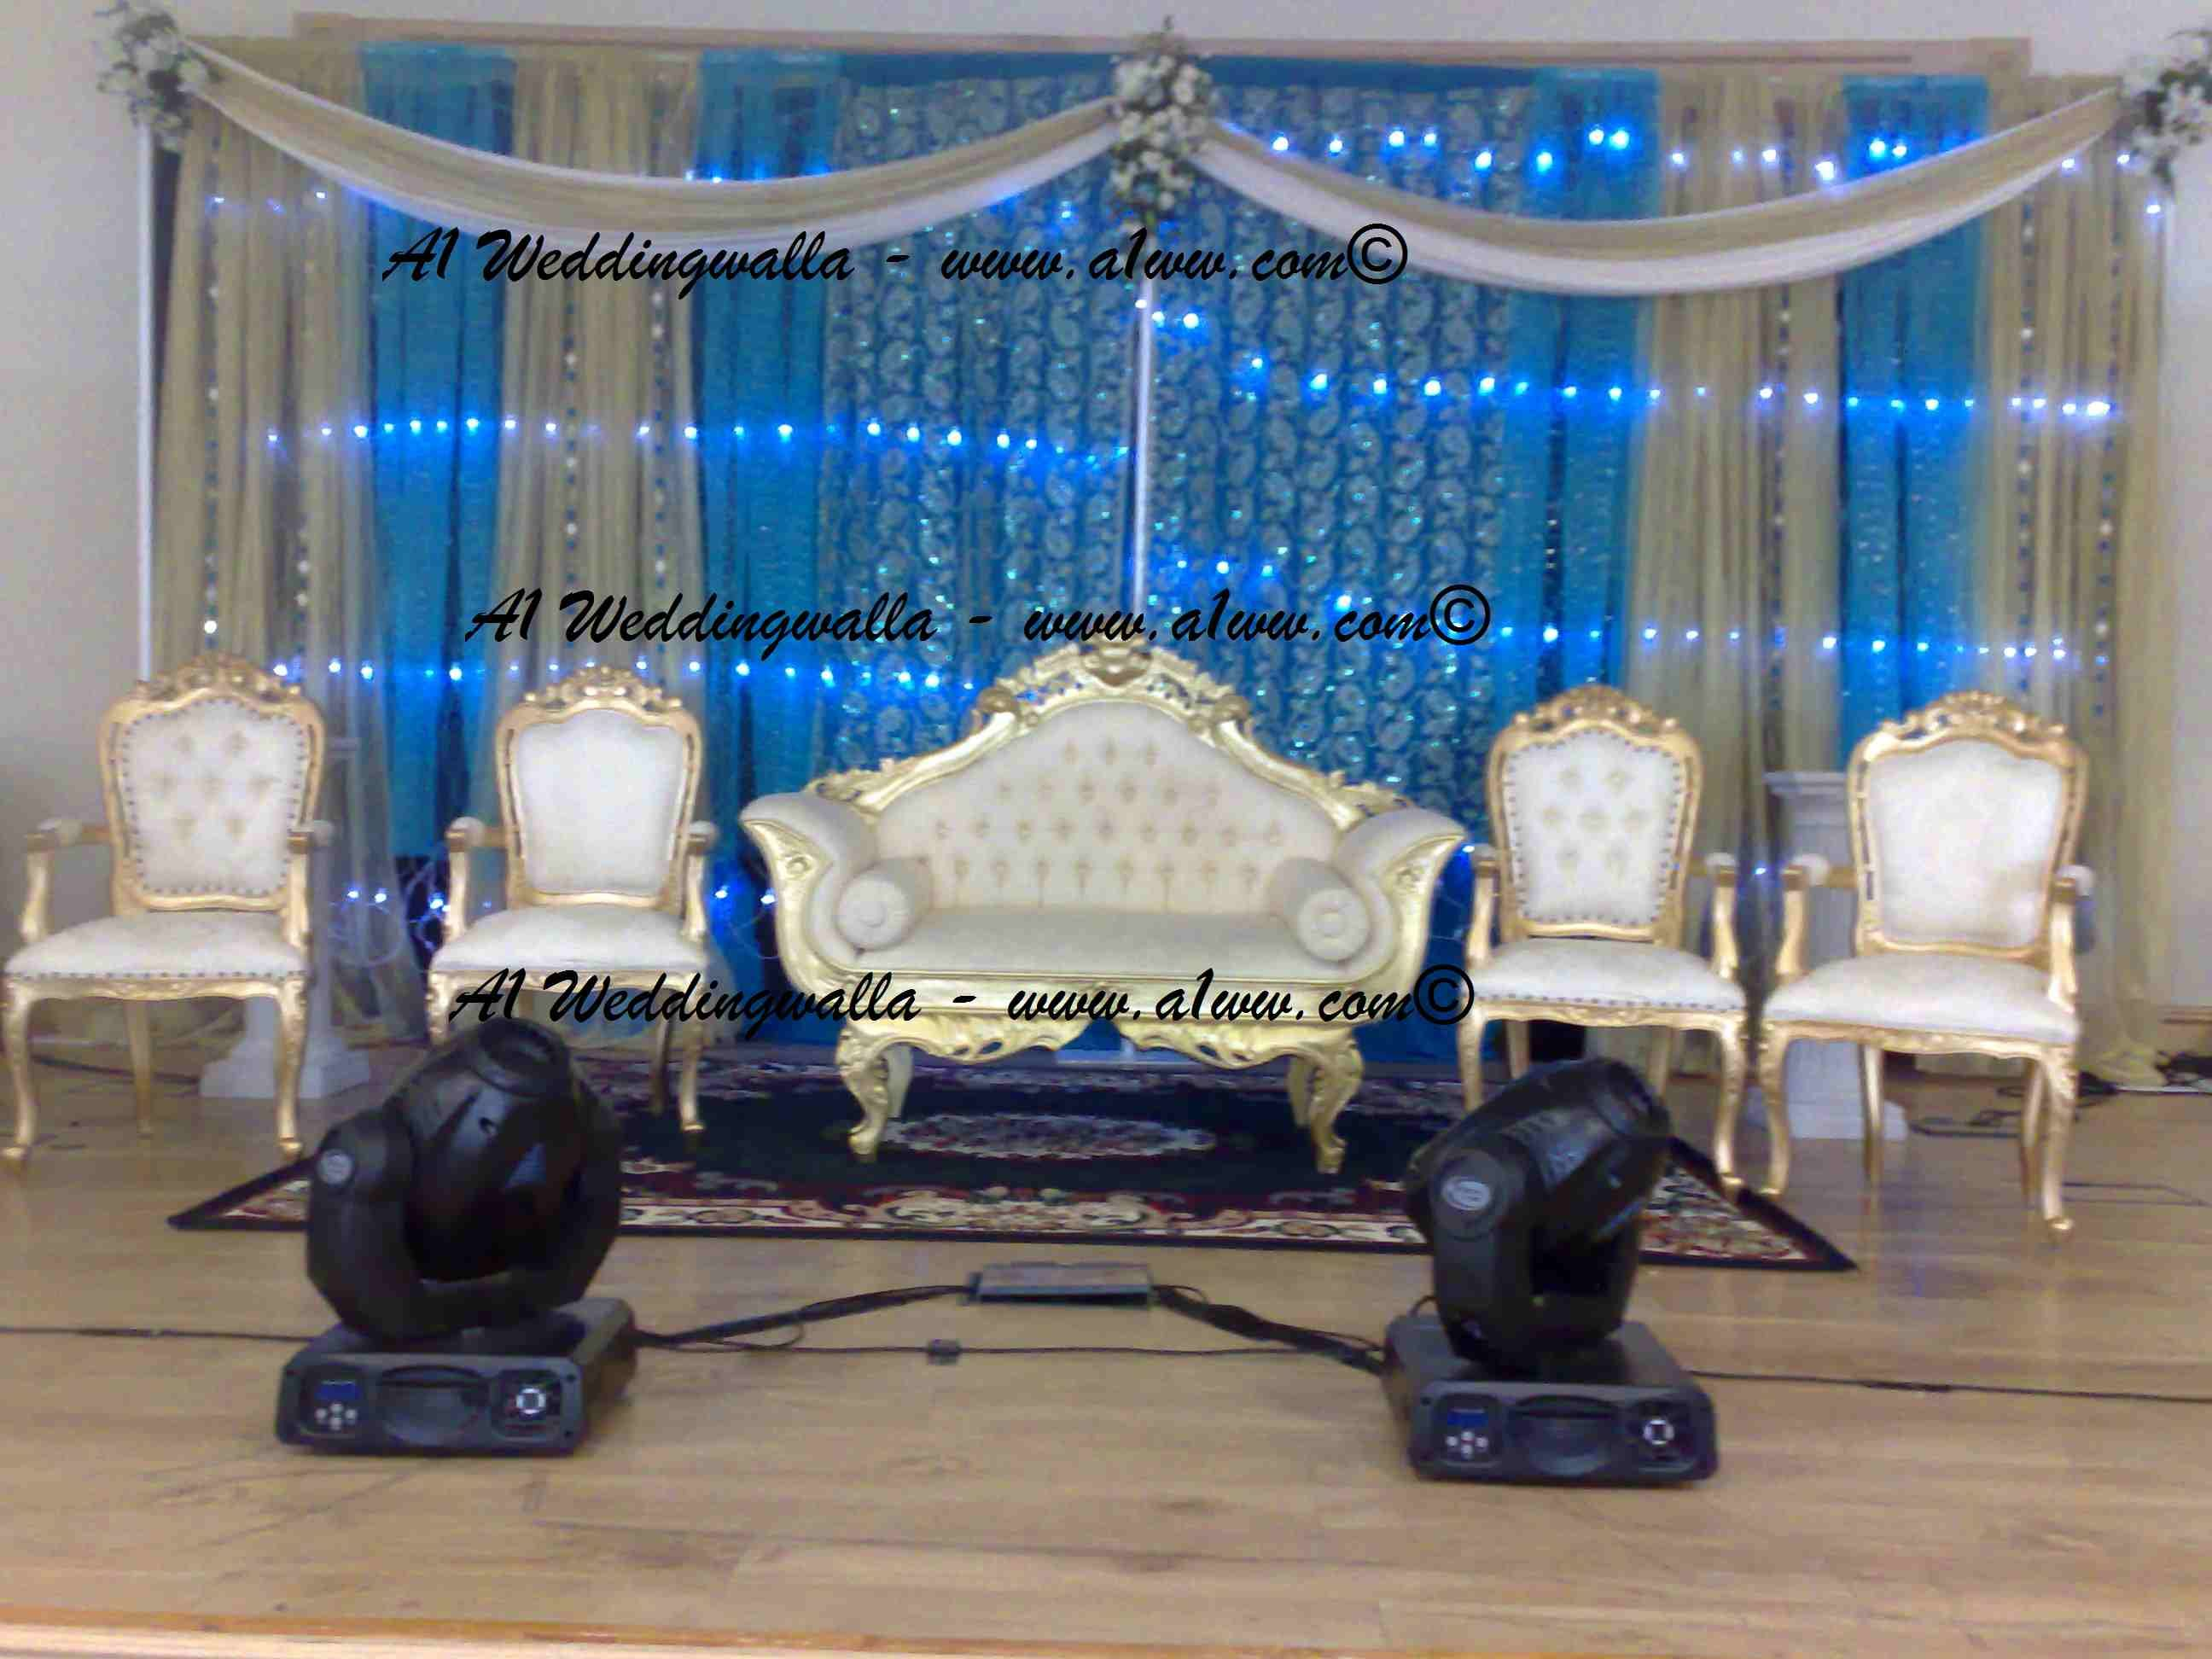 india wedding decoration designs world wedding stages designs world wedding stages formats and decoration instant